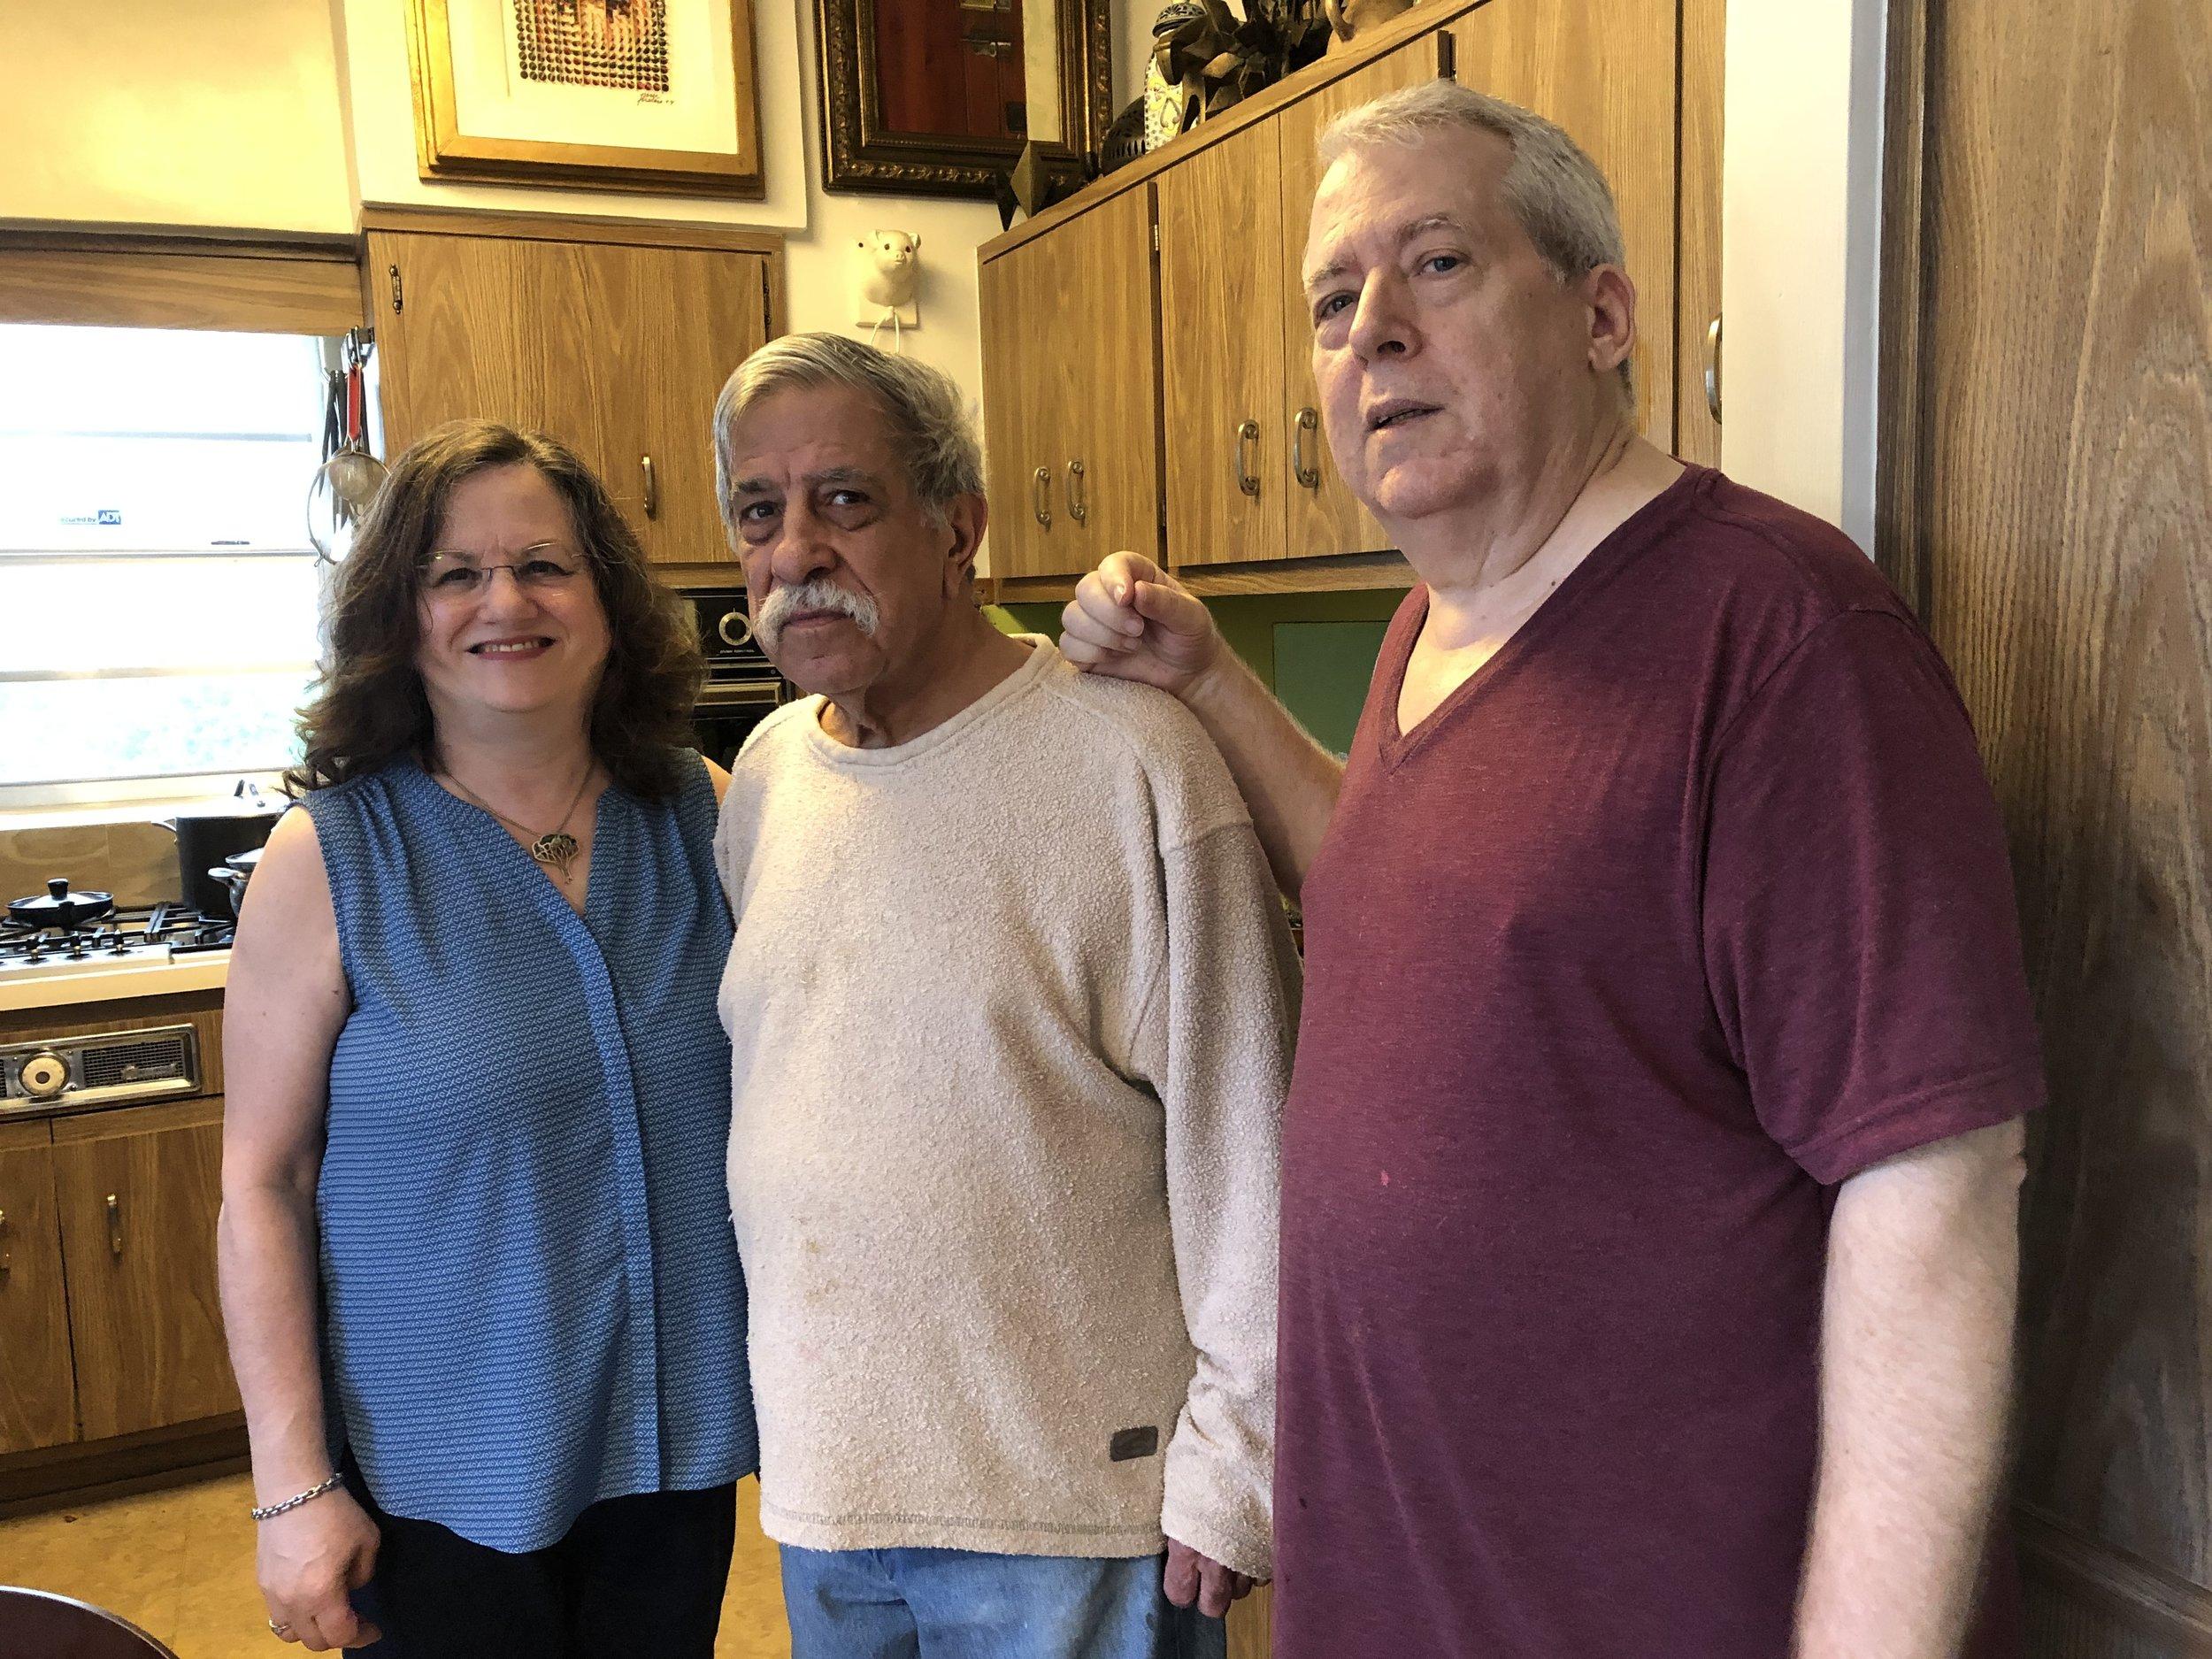 Sharon, Antonio and Chuck February 2019 Florida